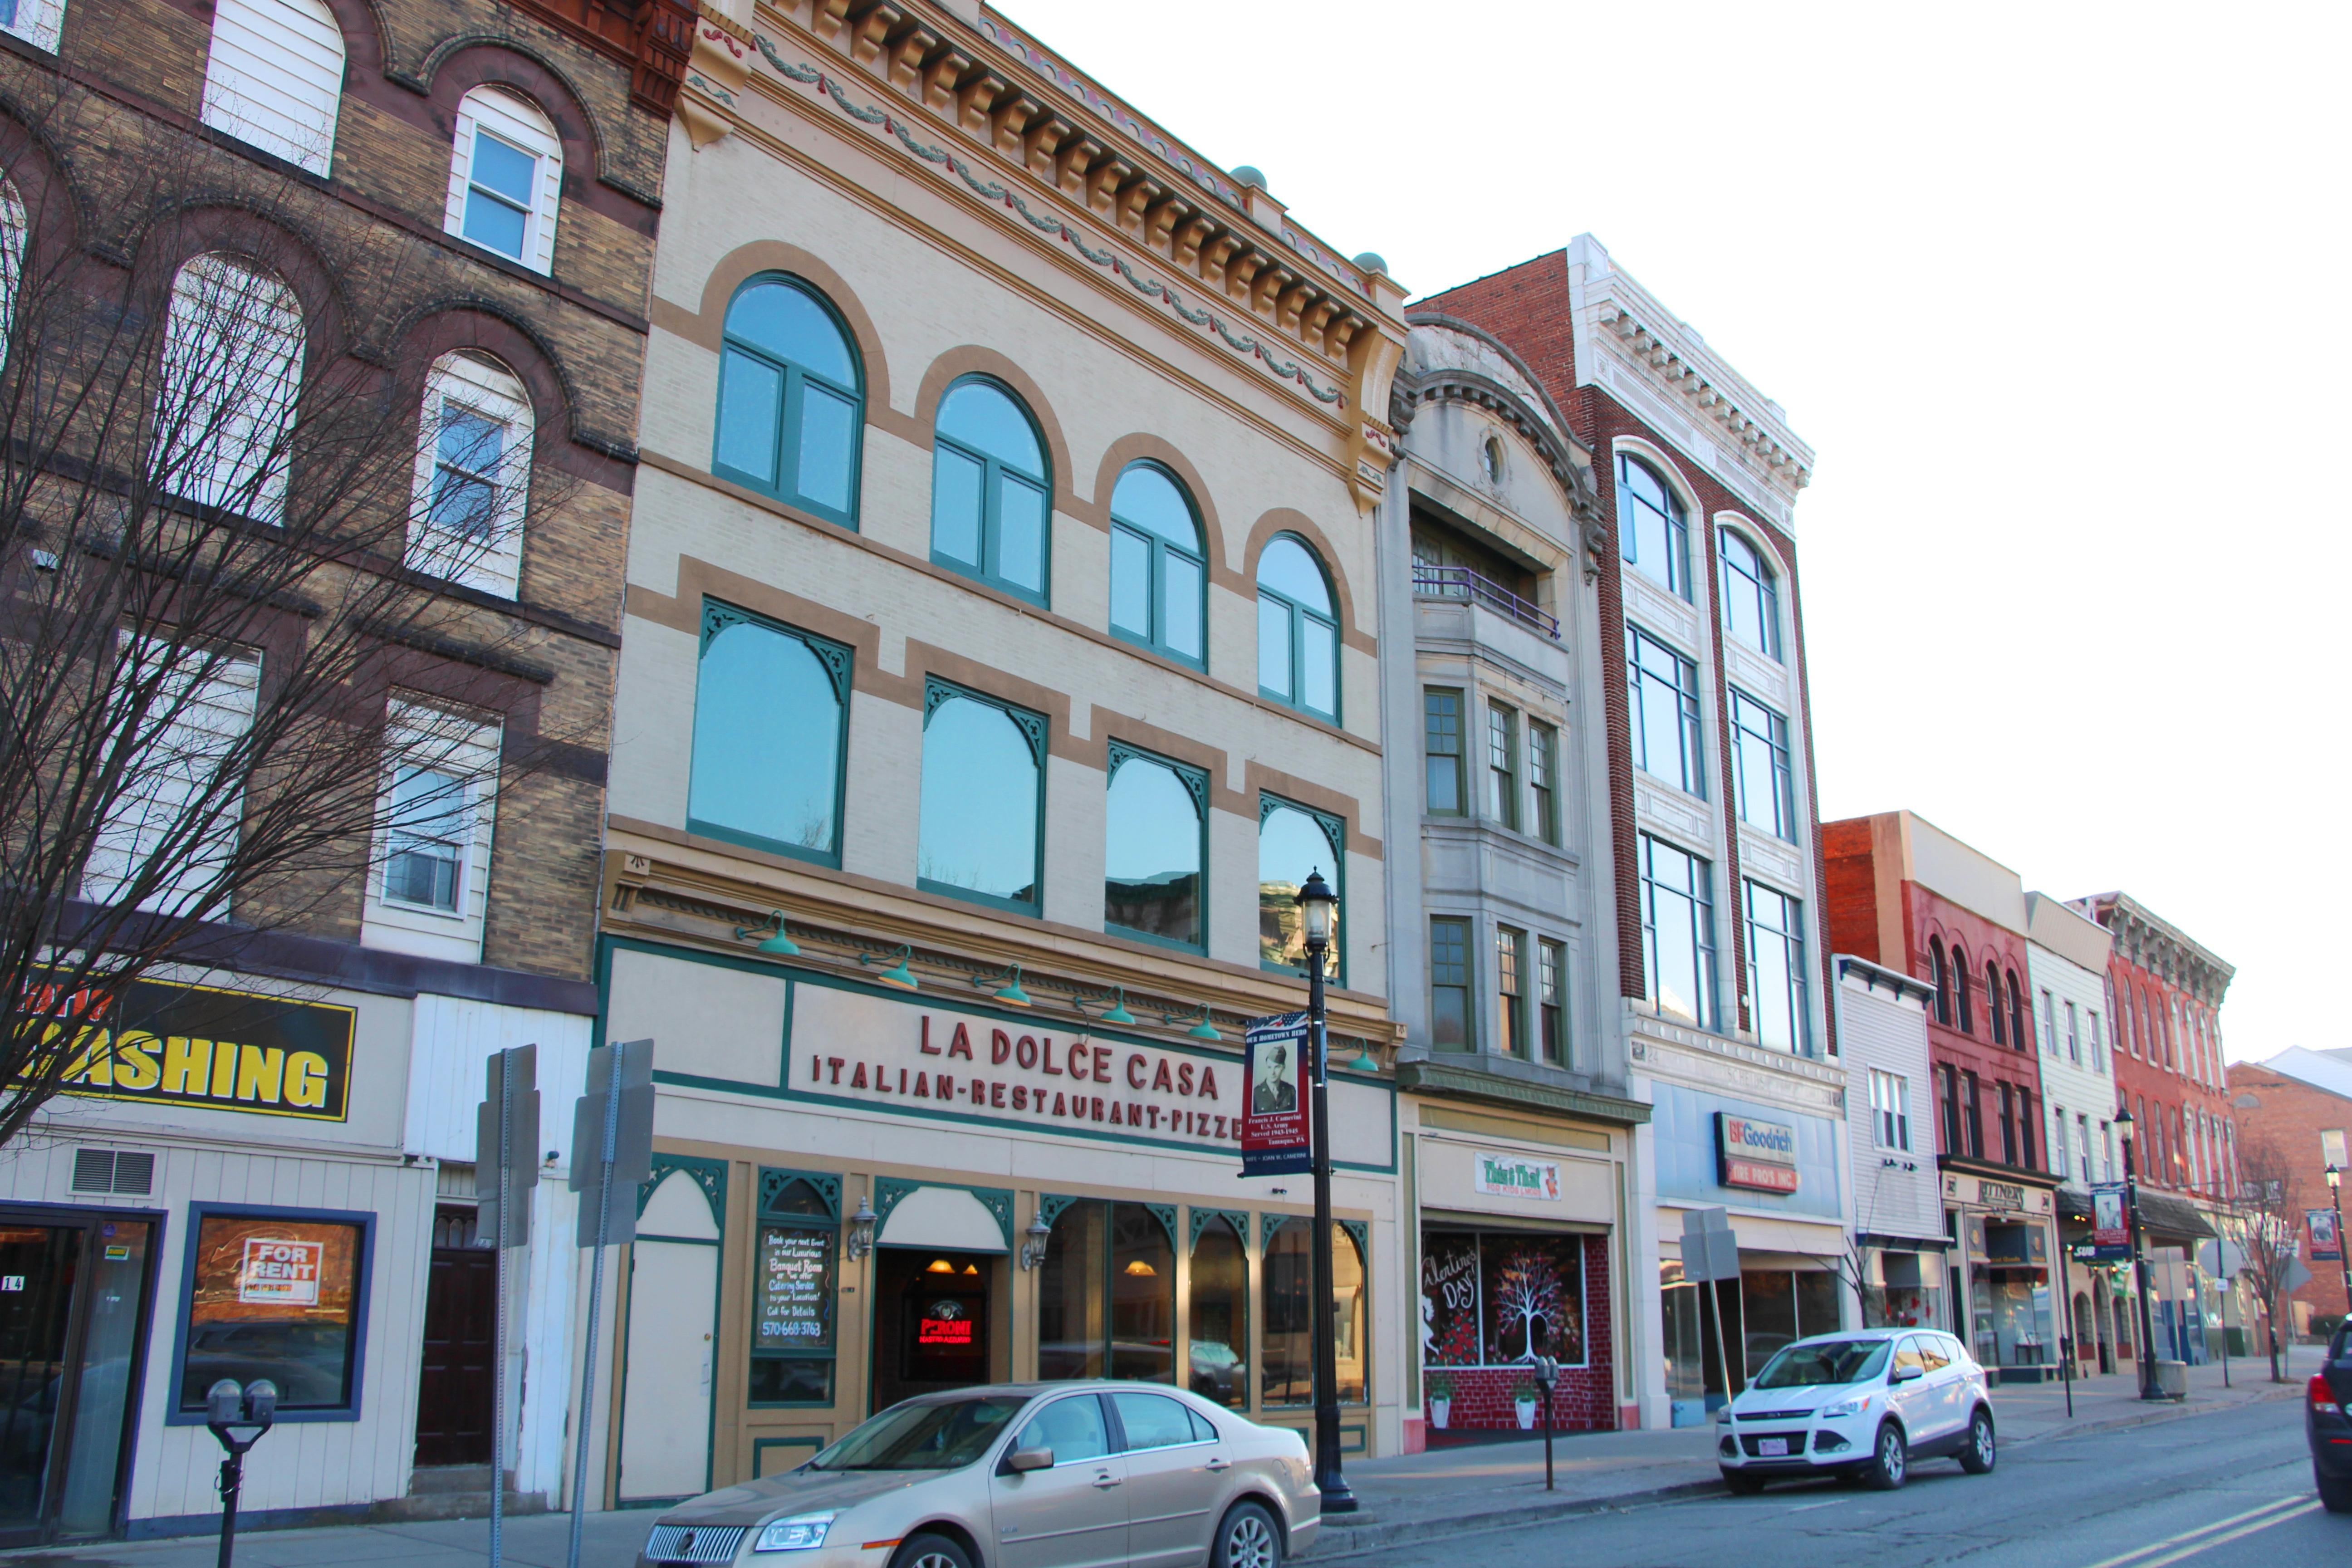 RANDOM PHOTO: West Broad Street